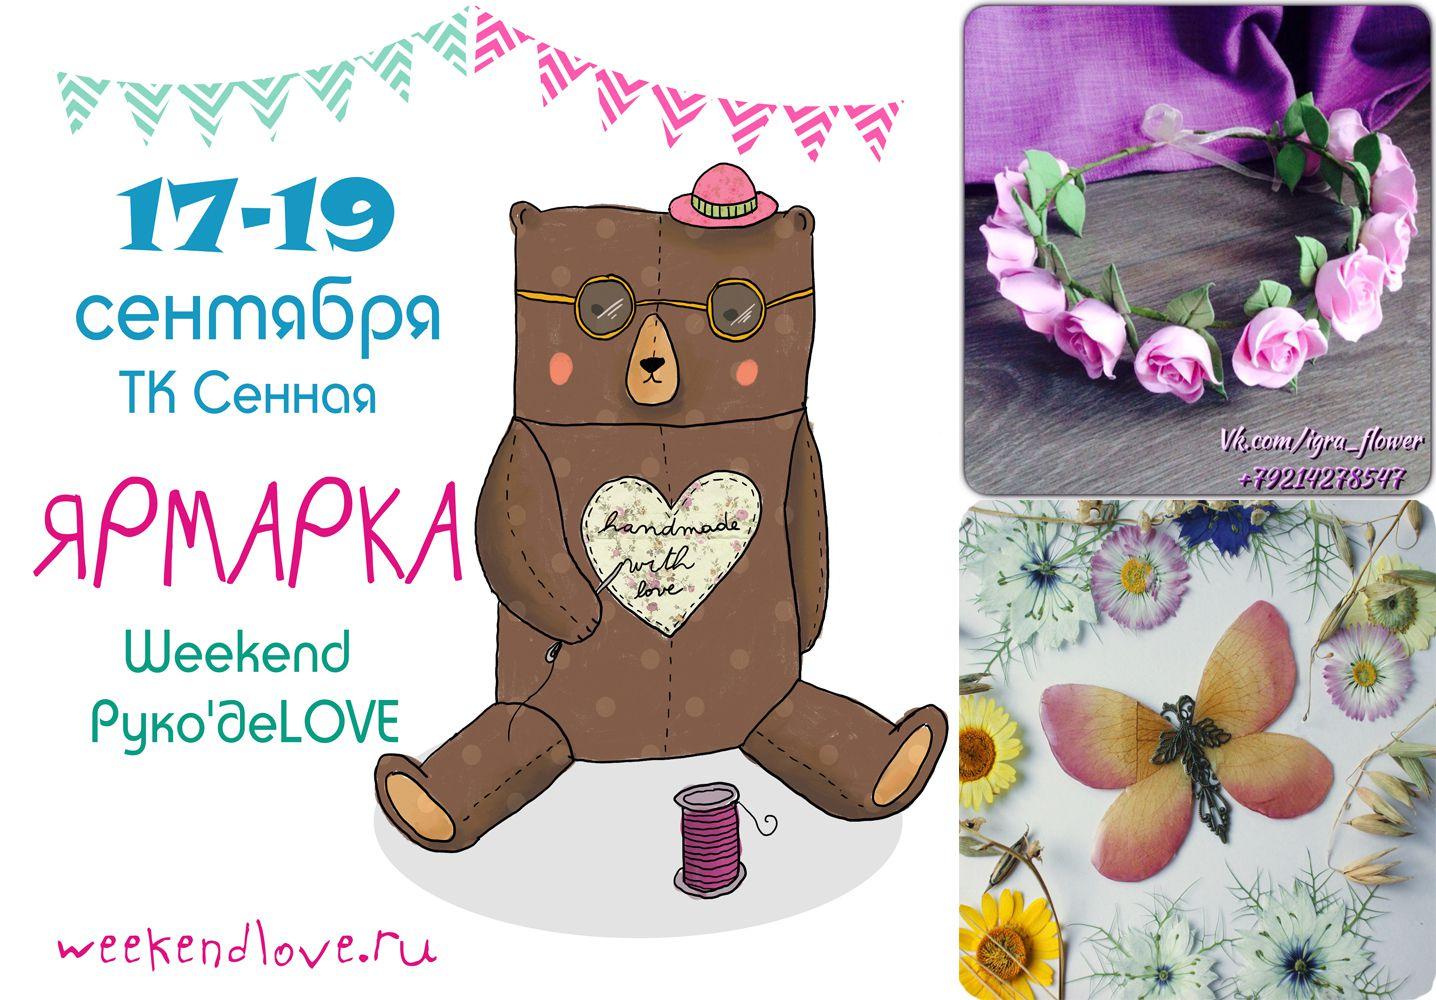 маркет weekend_руко'деlove выставка спб галерея_мастеров ярмарка